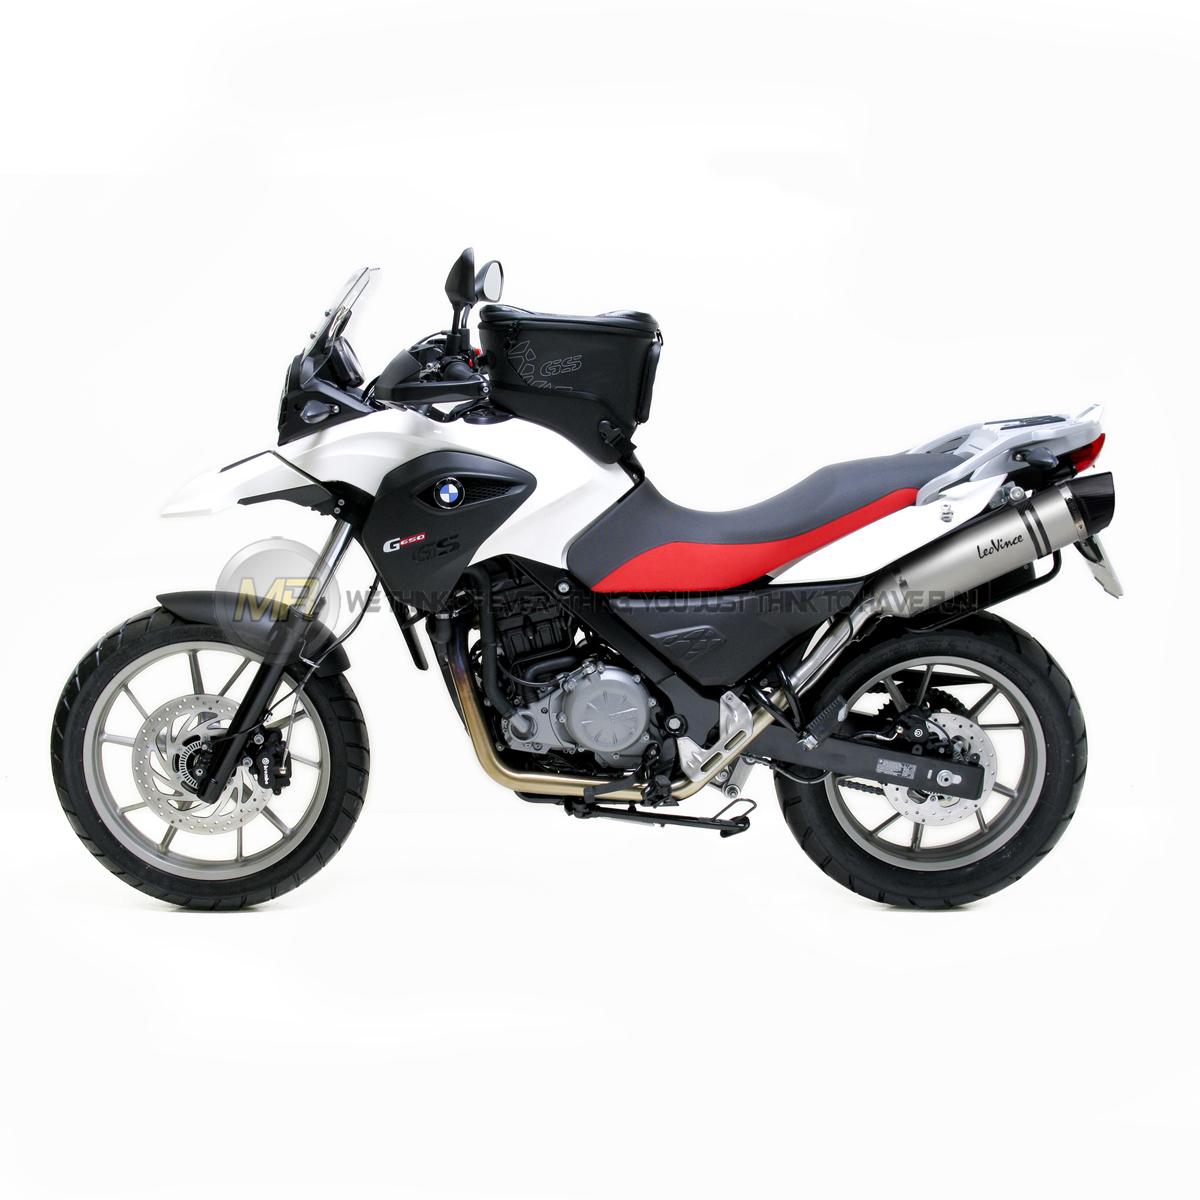 Bmw G 650 Gs Sertao 2012 12 Exhaust Leovince Lv One Evo Silencer